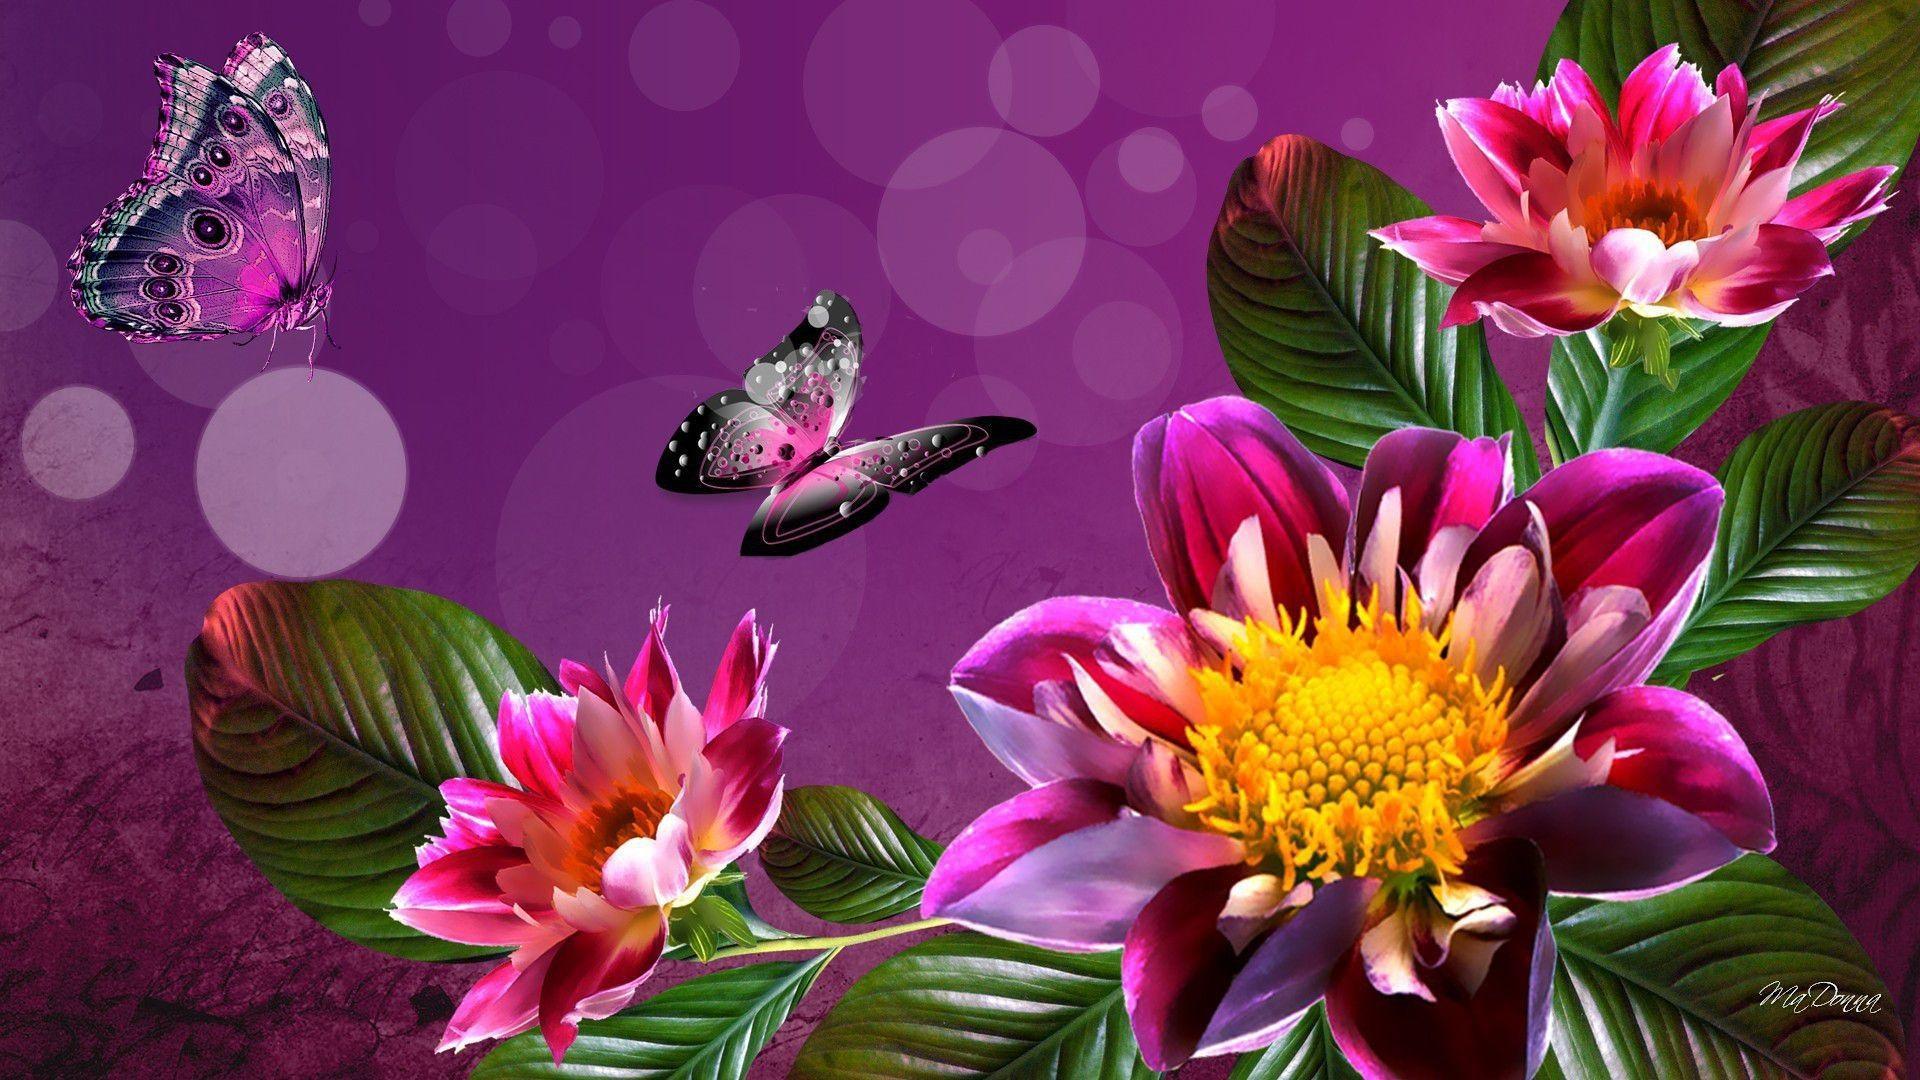 3d Flower Wallpaper For Mobile Hd Pics Of Smartphone D   Heavenwalls .